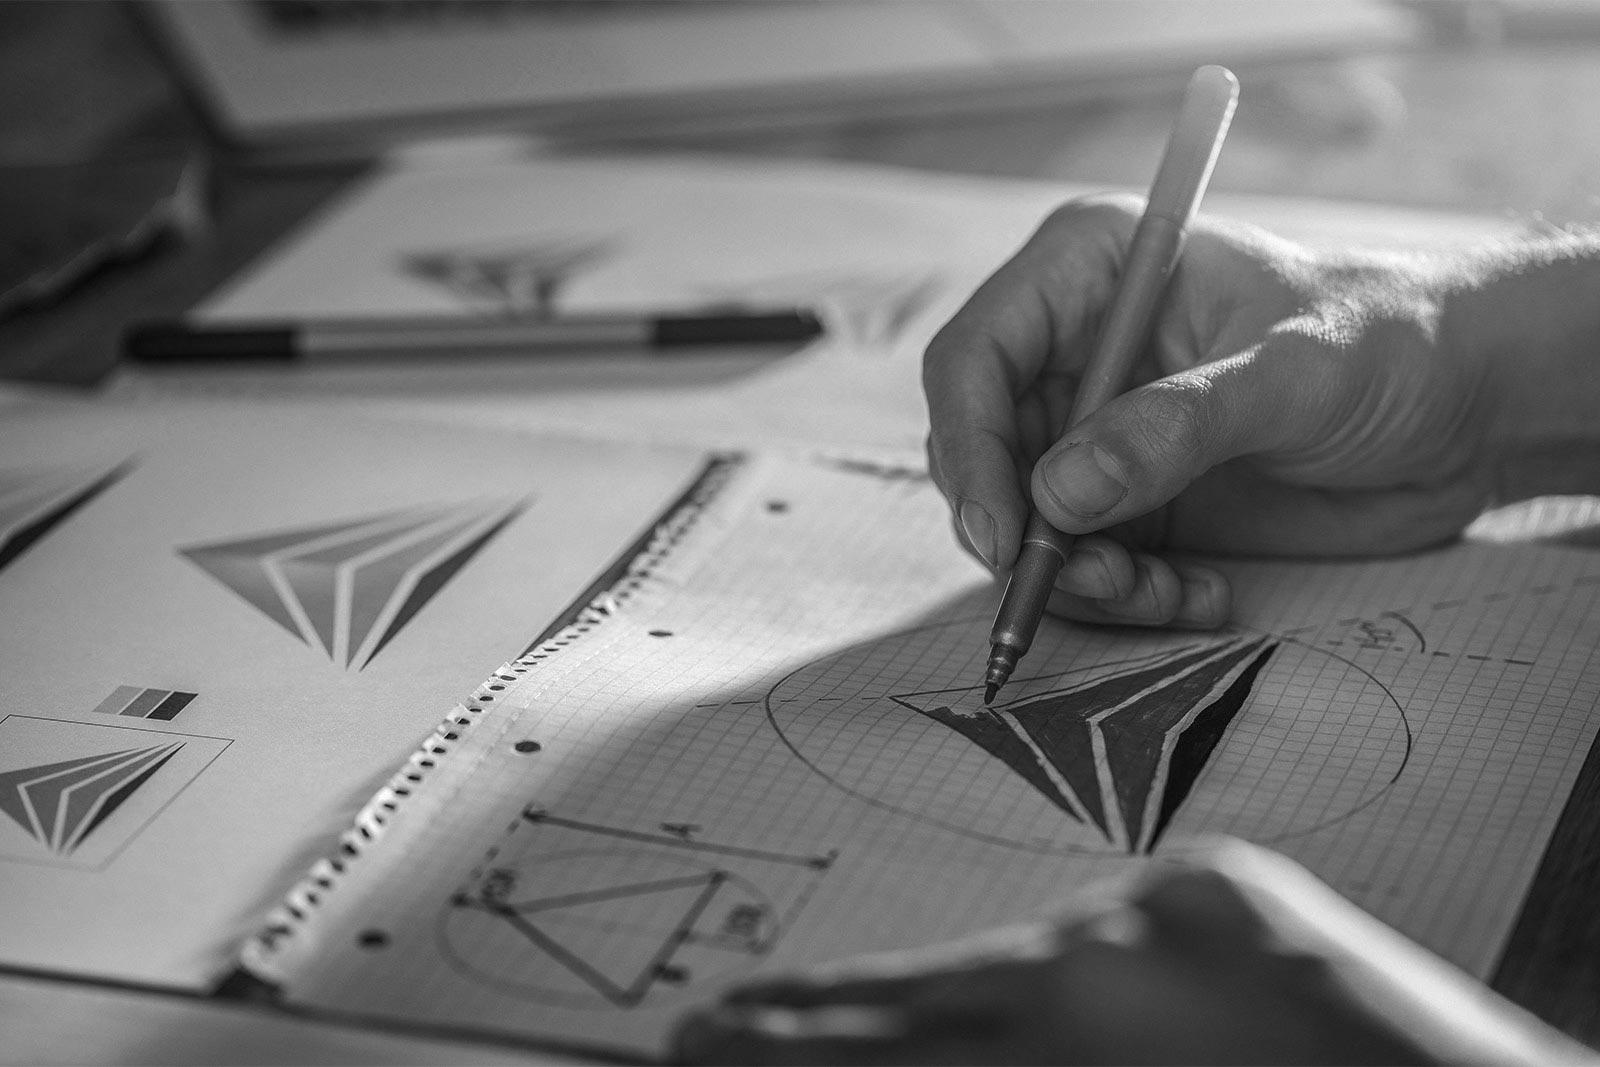 A graphic designer sketches out a logo design